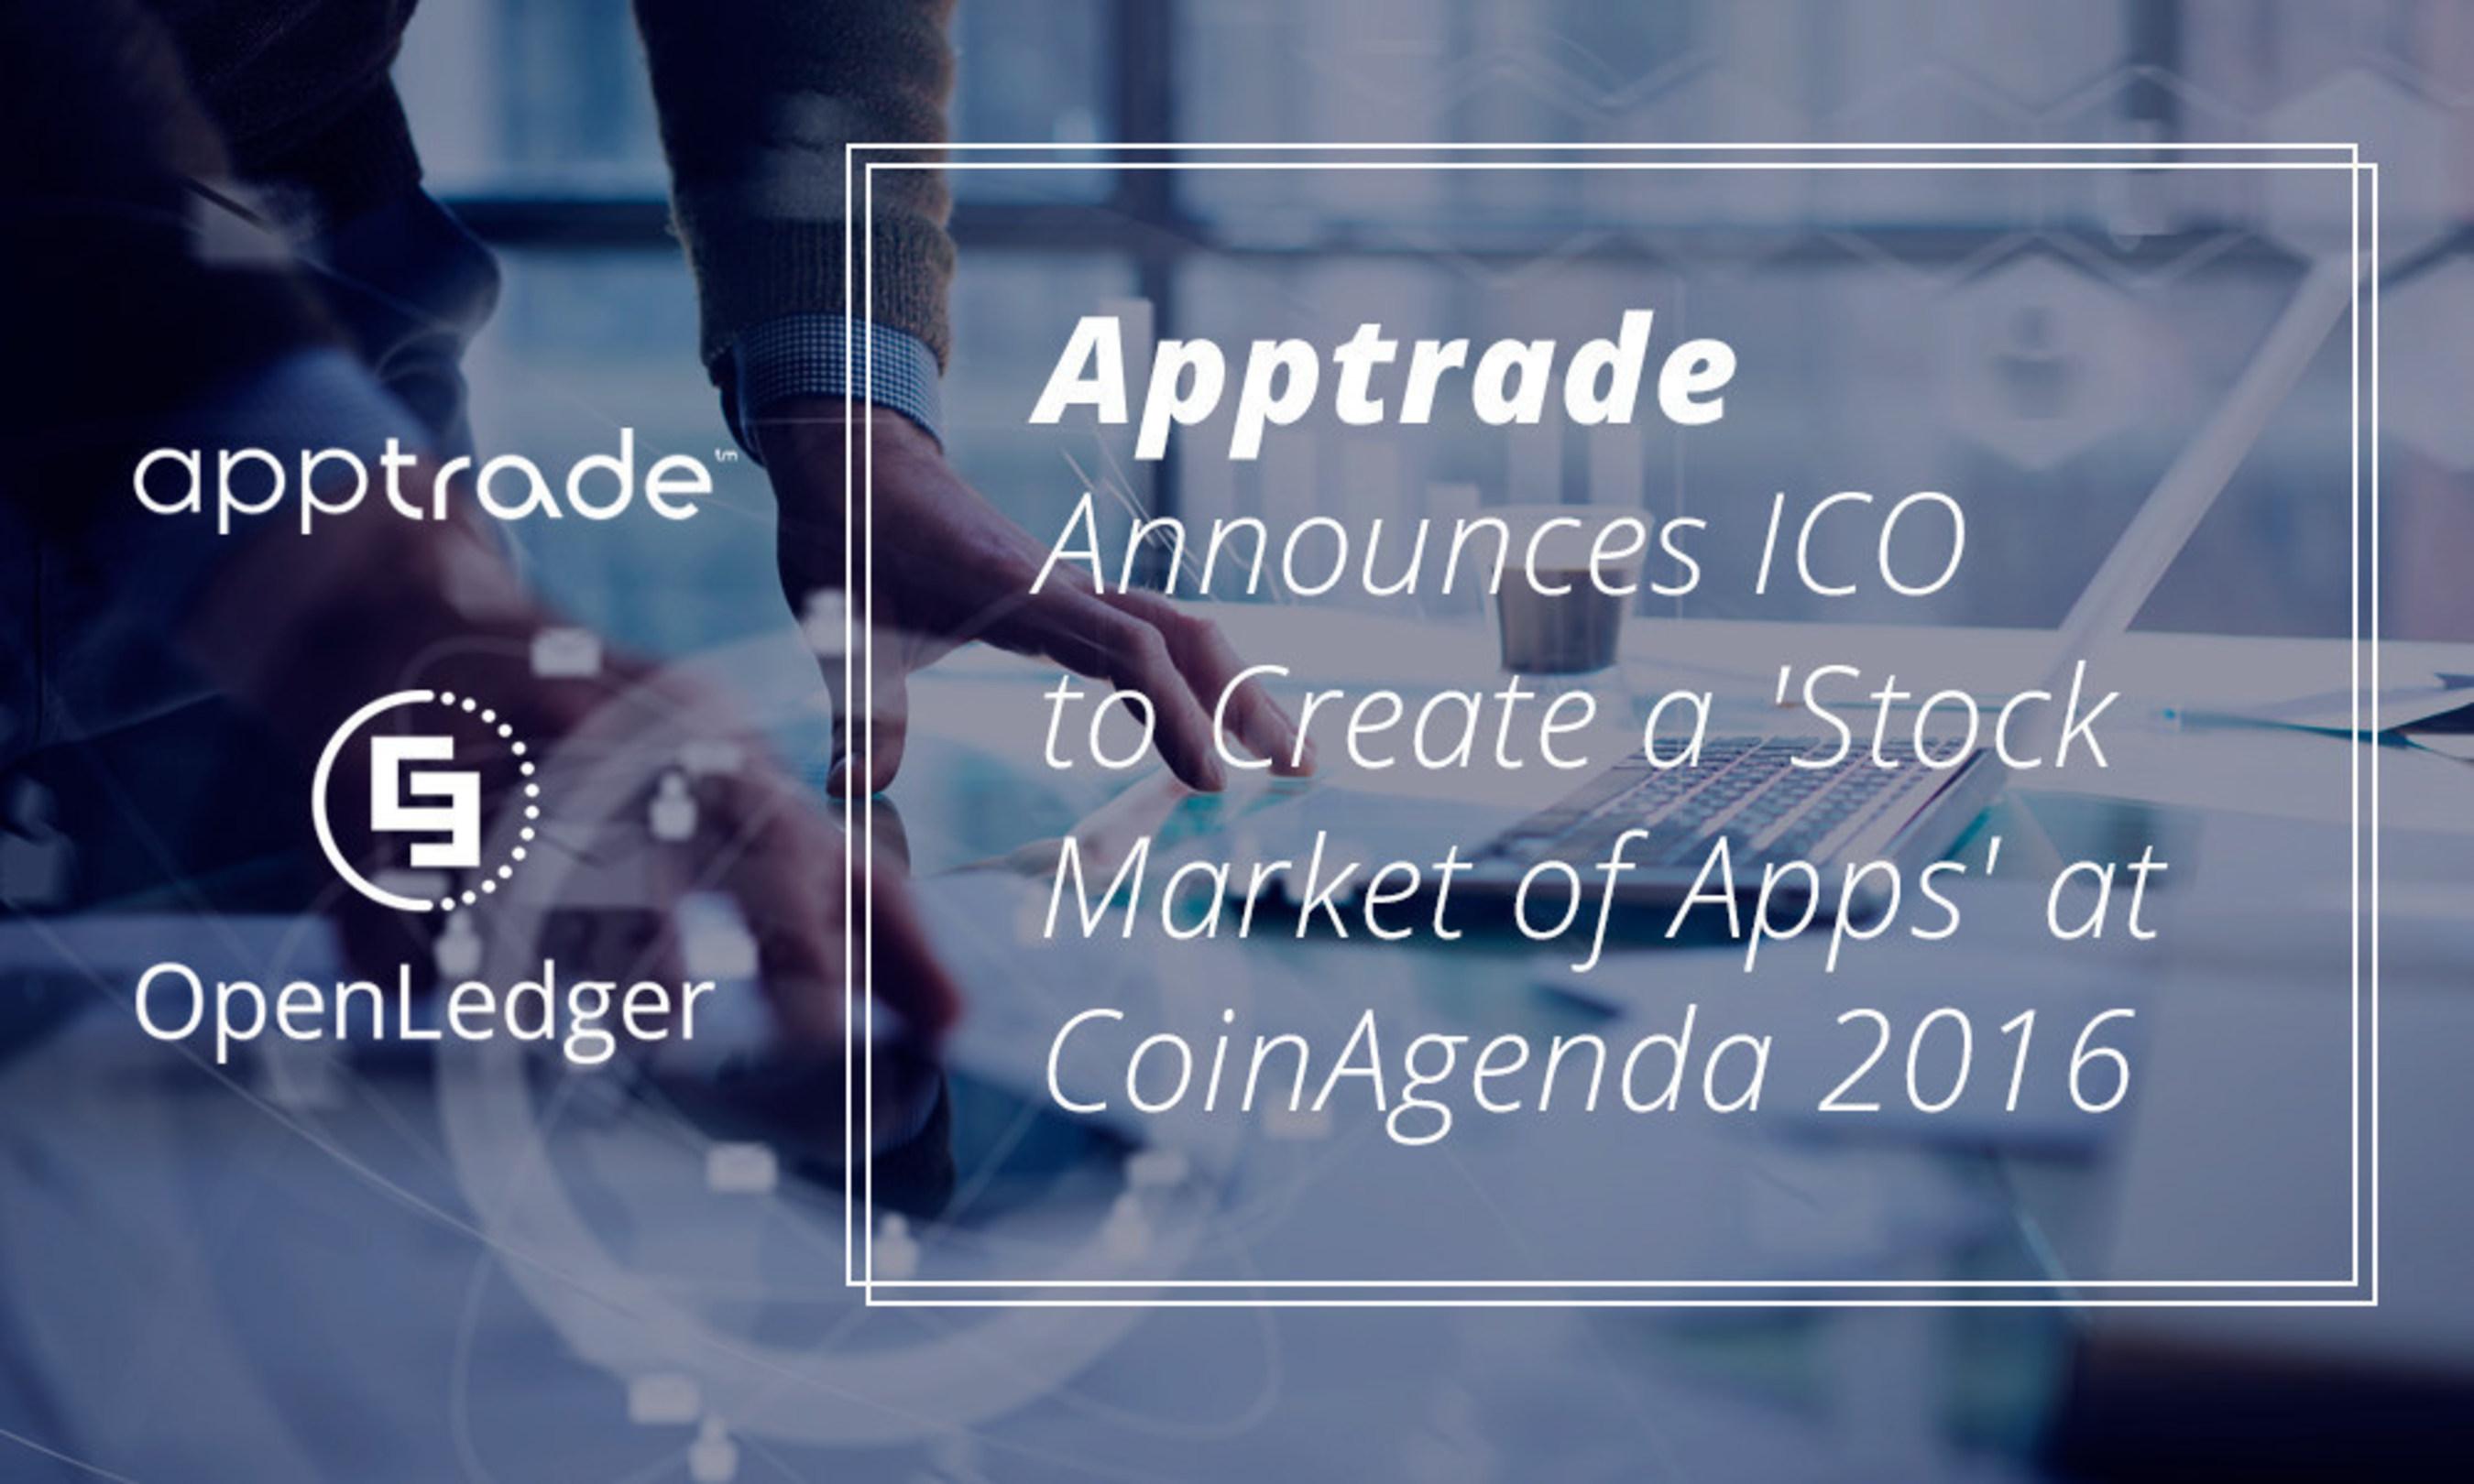 Apptrade Announces ICO to Create a 'Stock Market of Apps' at Coin Agenda 2016